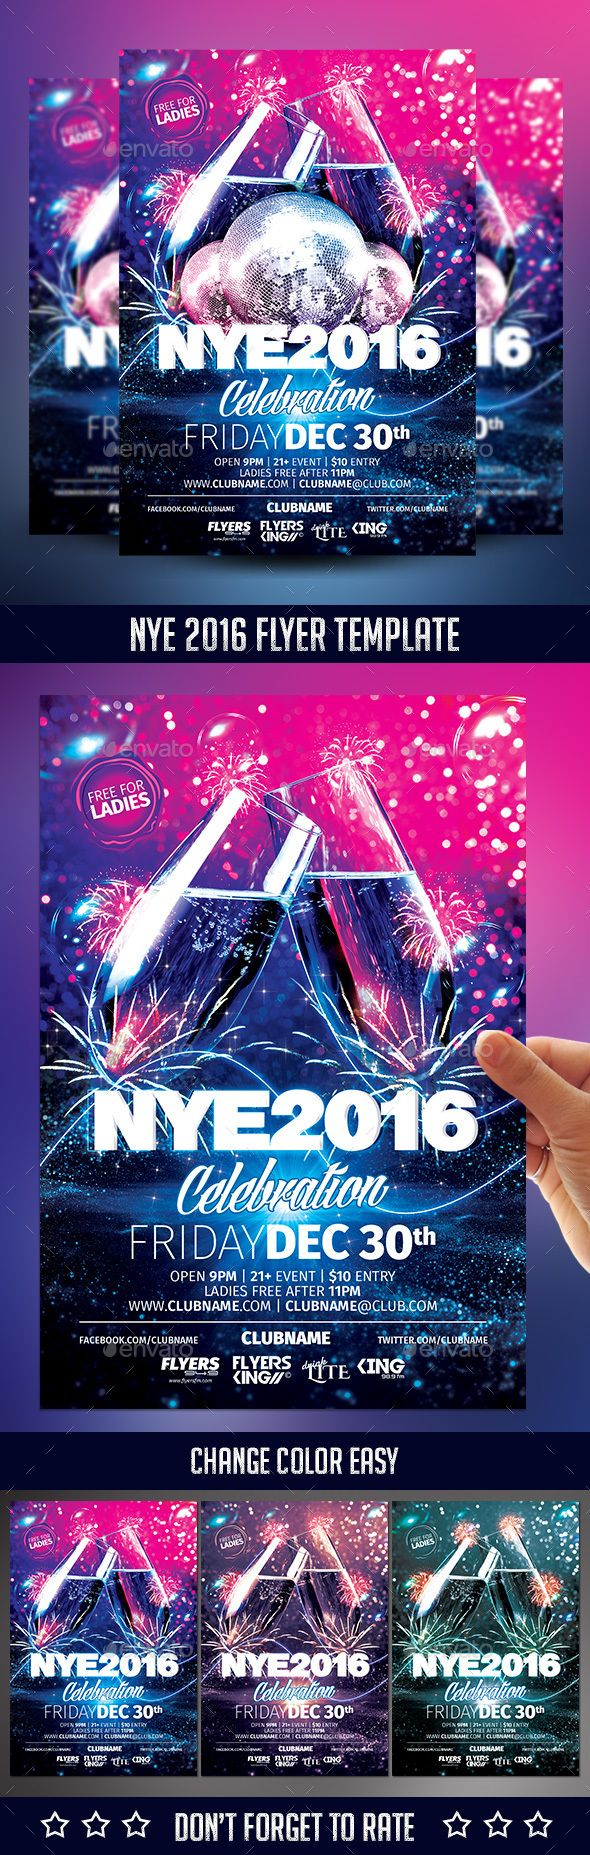 NYE 2016 Flyer Template PSD #design Download: http://graphicriver.net/item/nye-2016-flyer-template/13907171?ref=ksioks